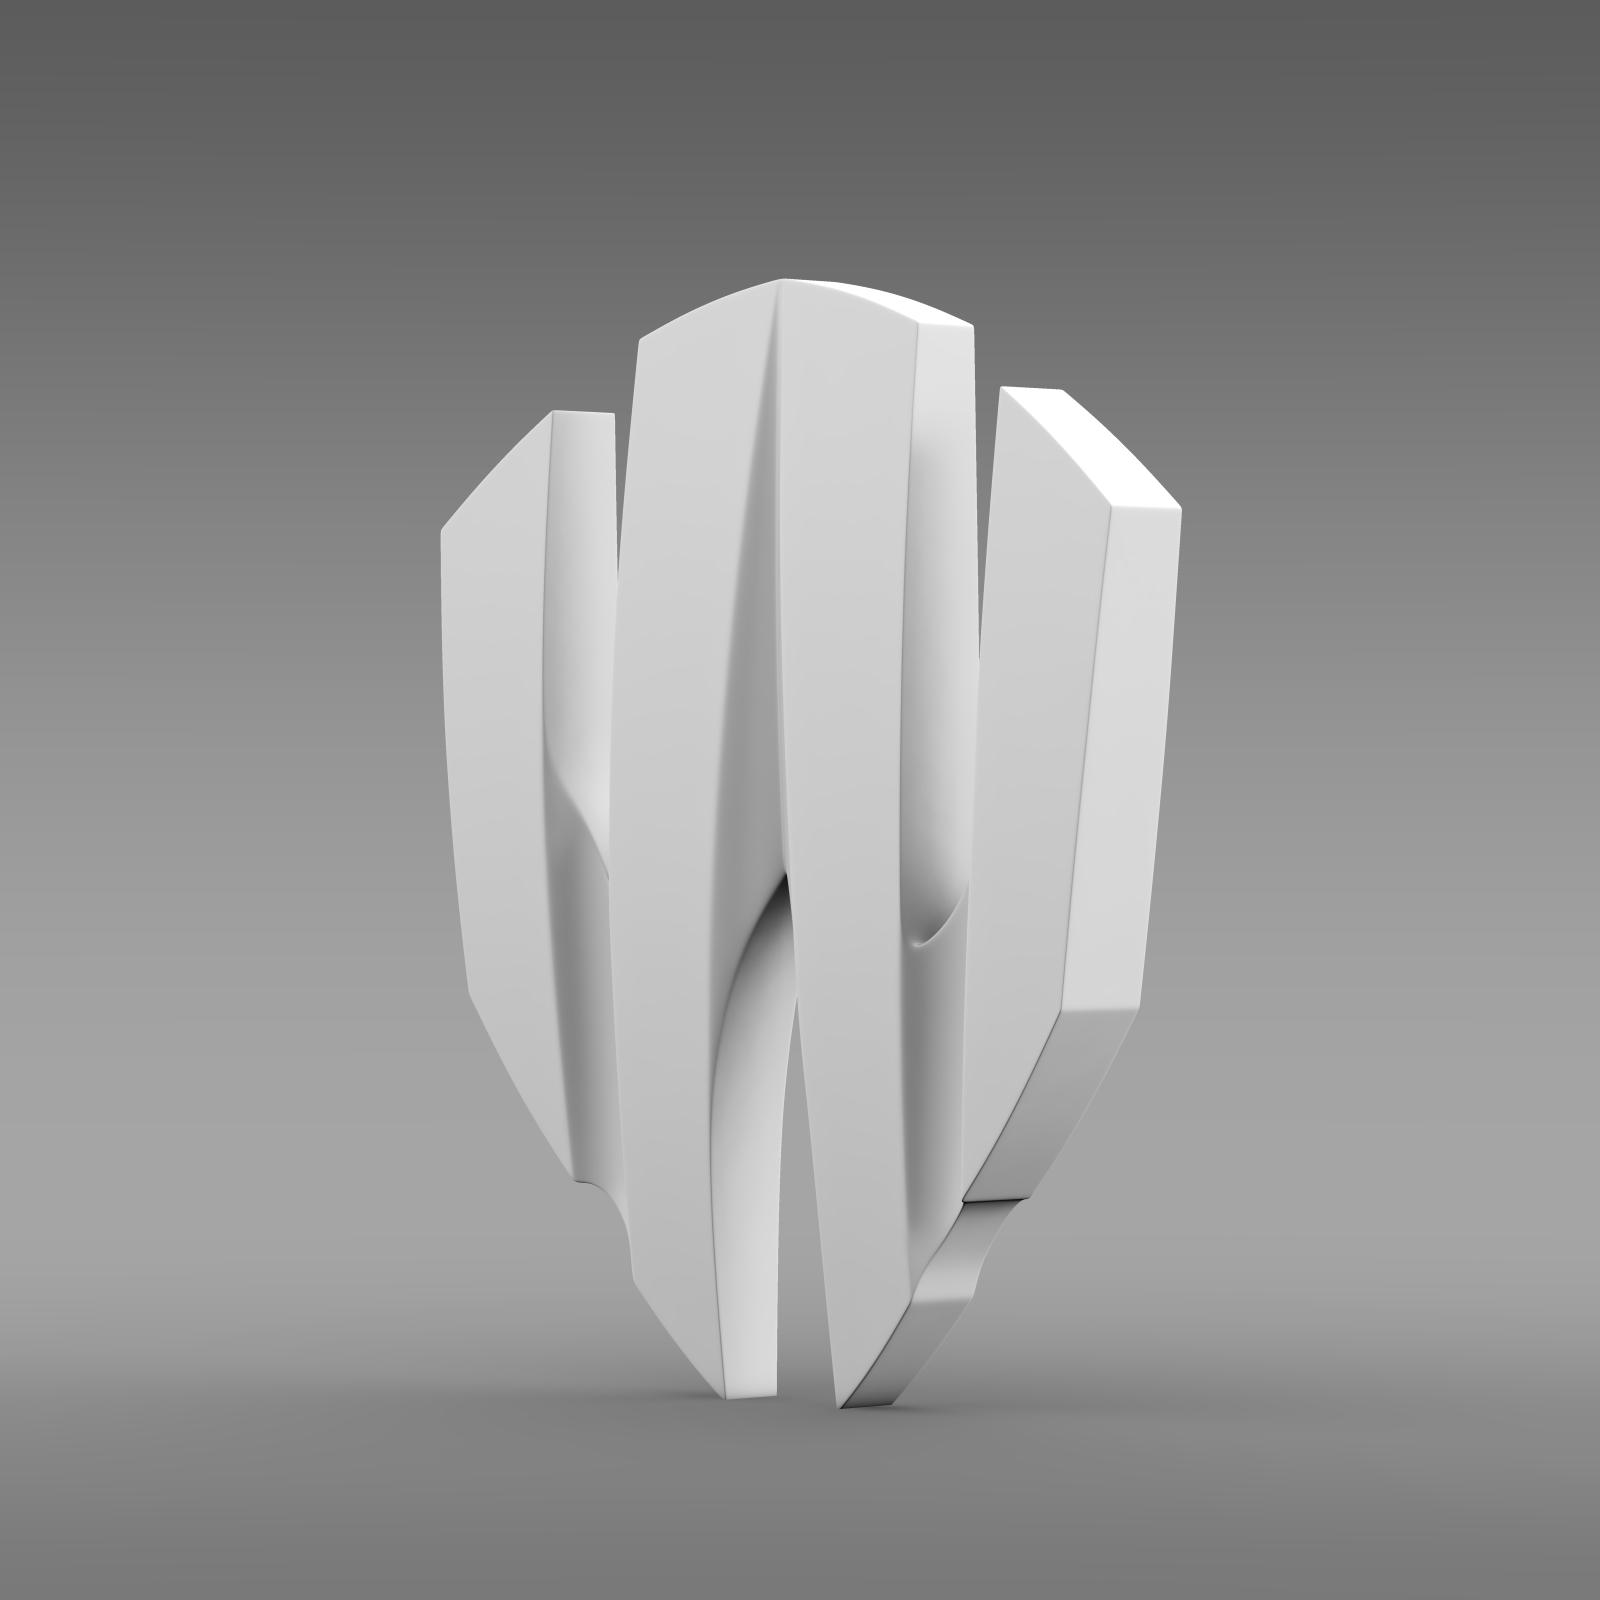 w motors lykan hypersport logo 3d model 3ds max fbx c4d lwo ma mb hrc xsi obj 213248